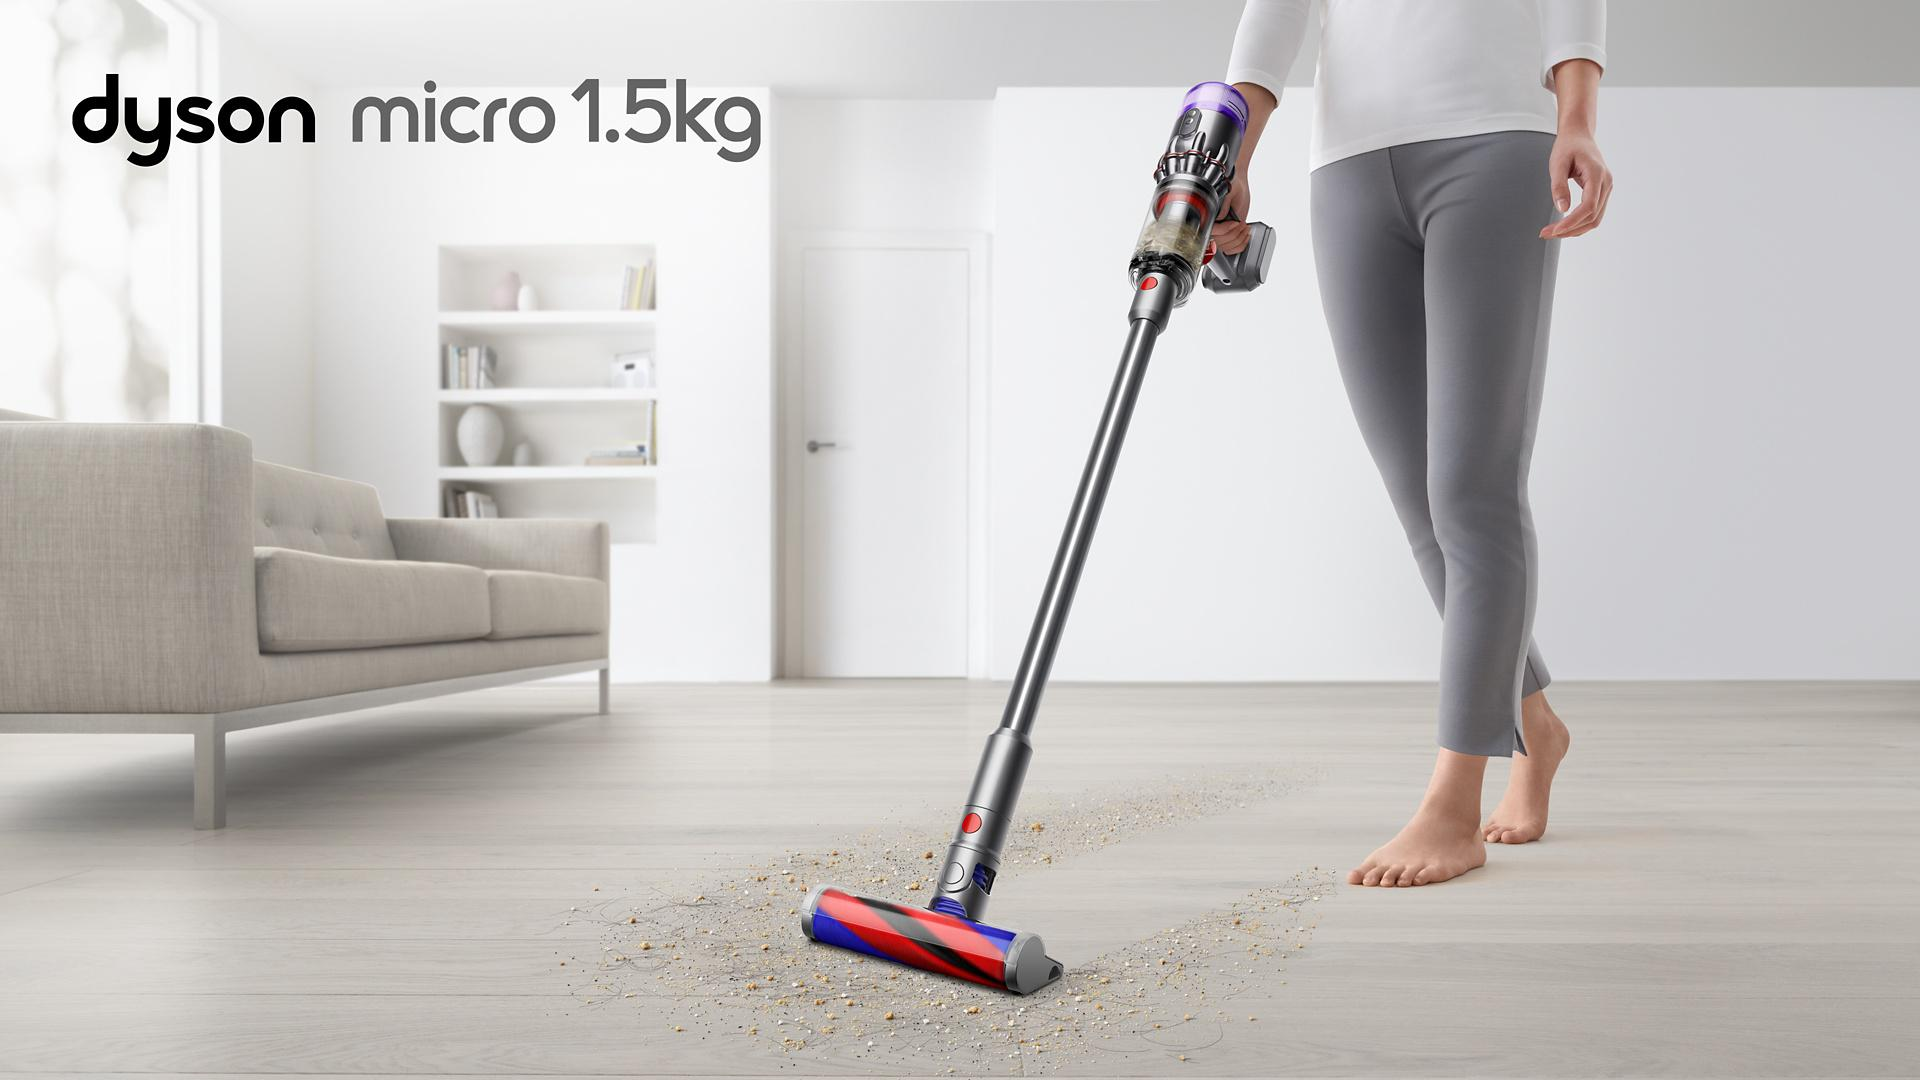 micro 1.5kg